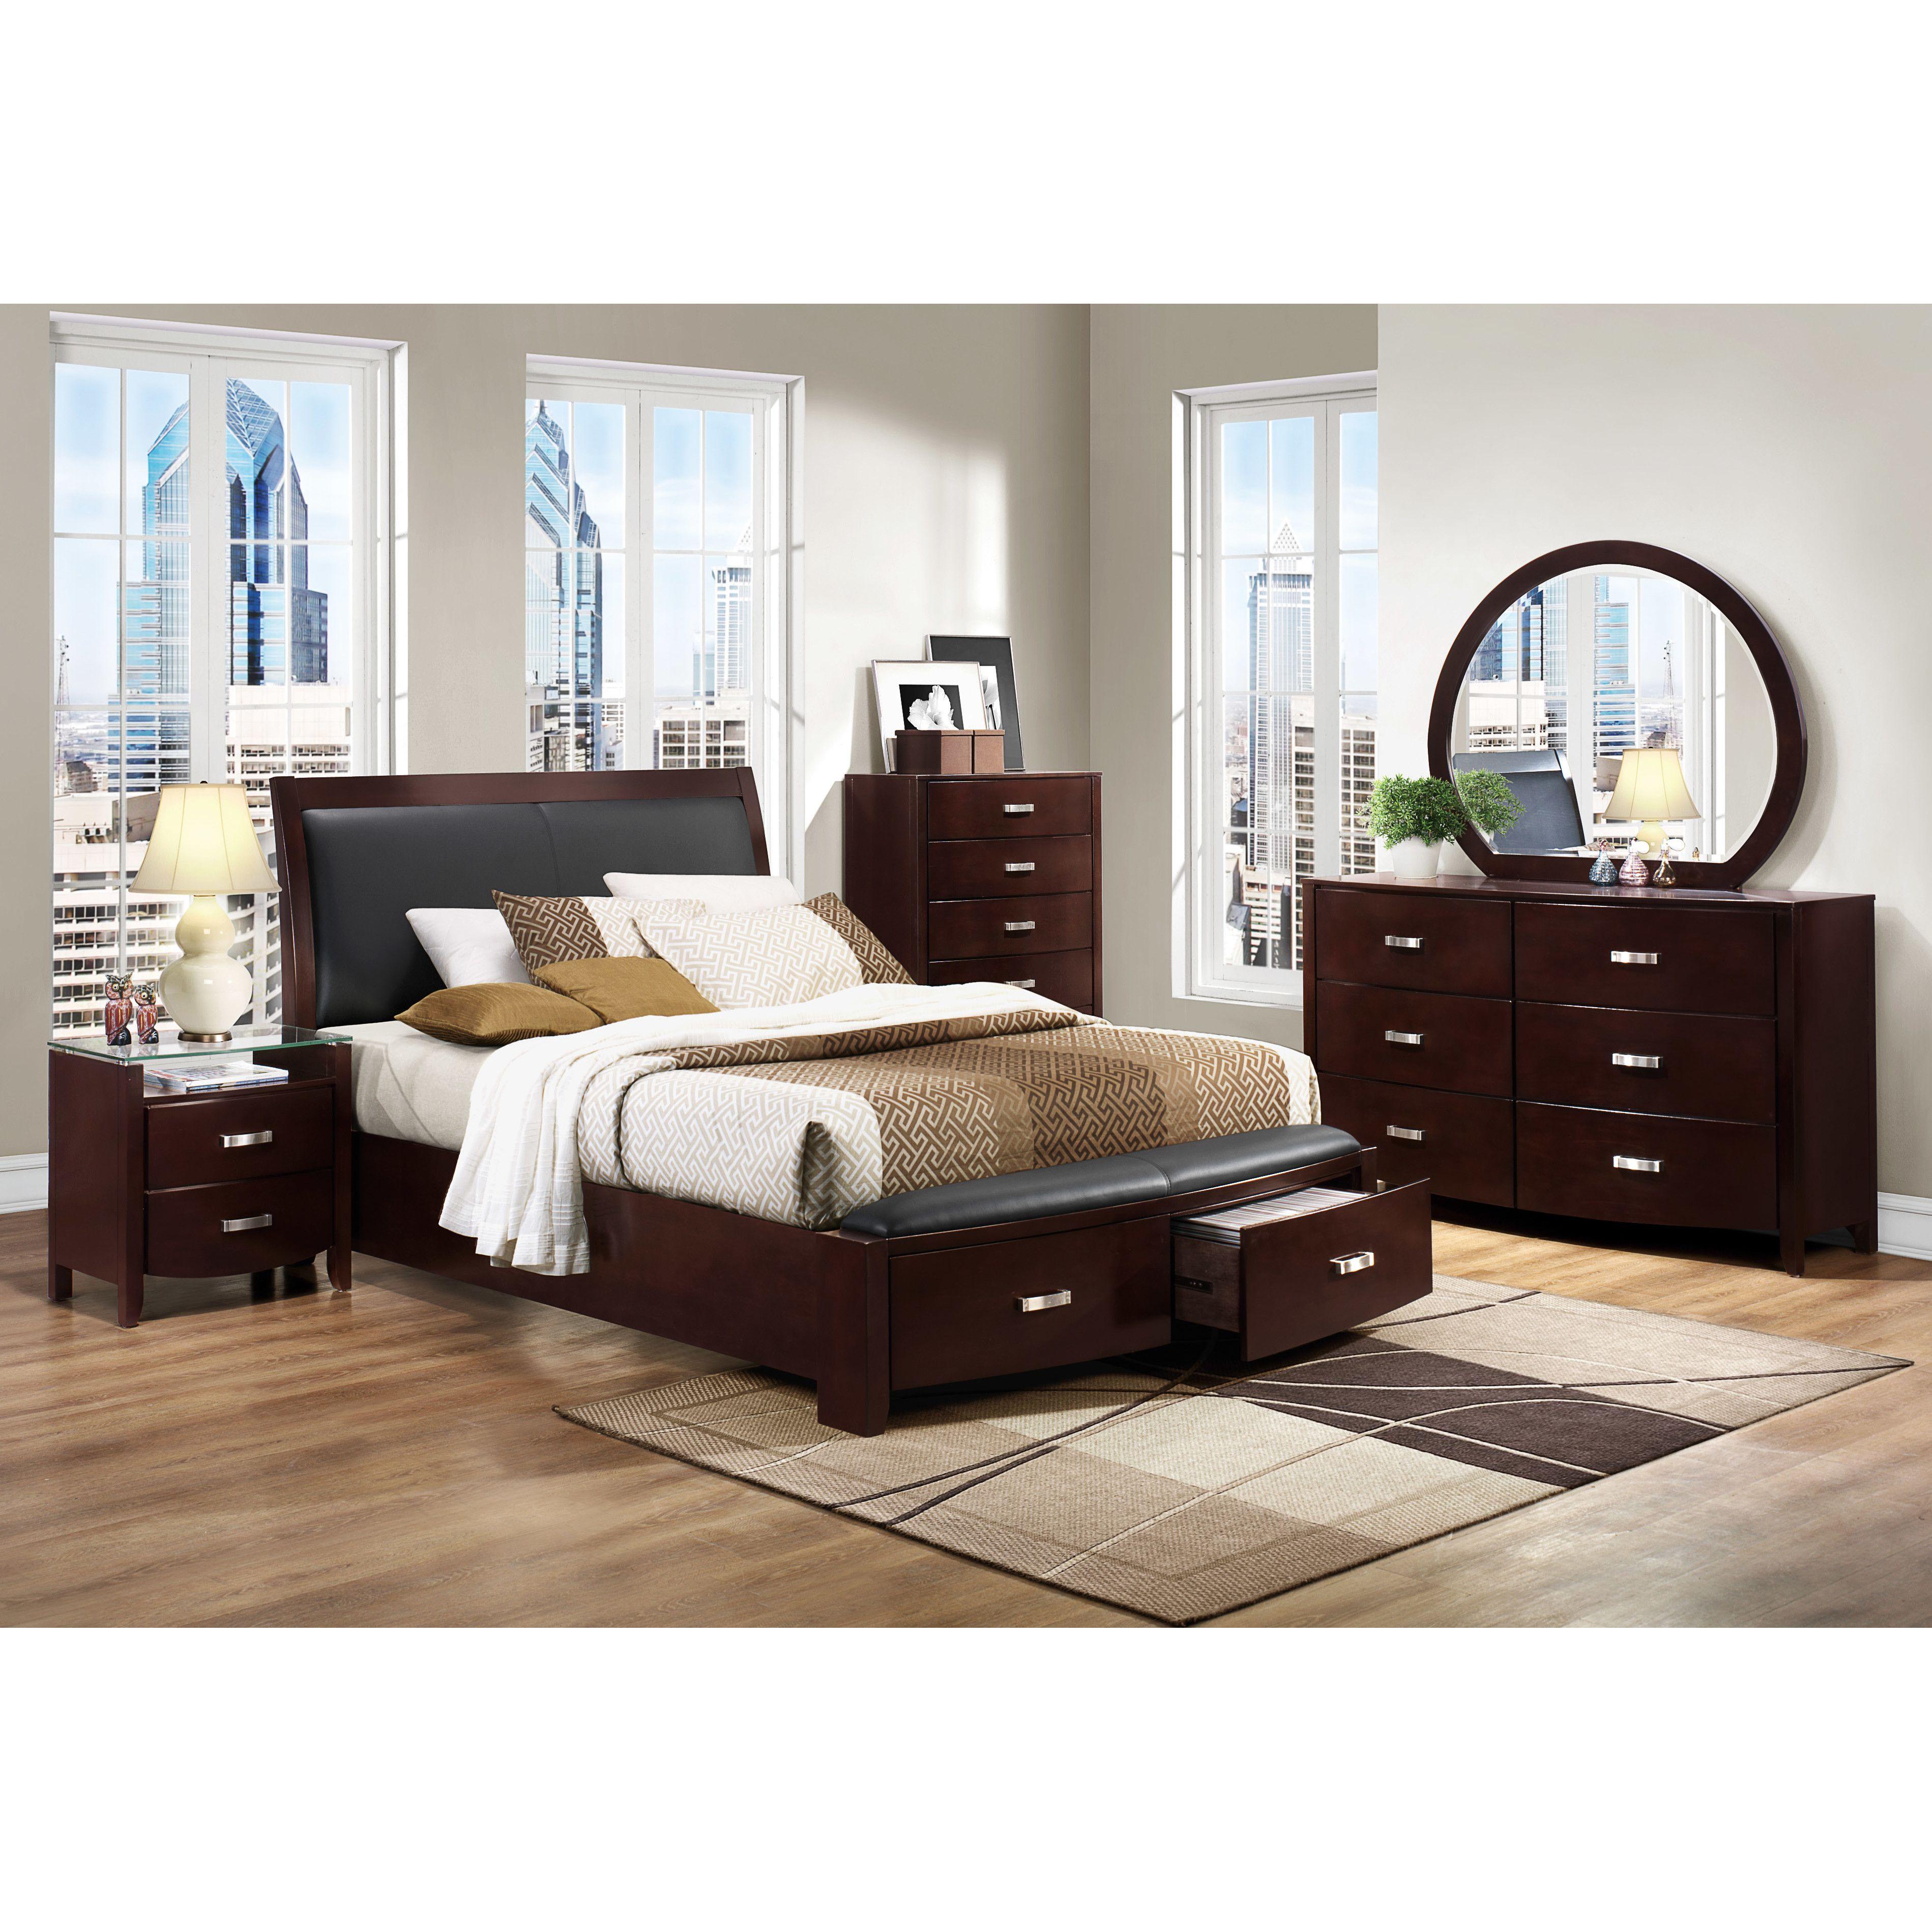 Woodhaven Hill Lyric Platform Customizable Bedroom Set U0026 Reviews   Wayfair